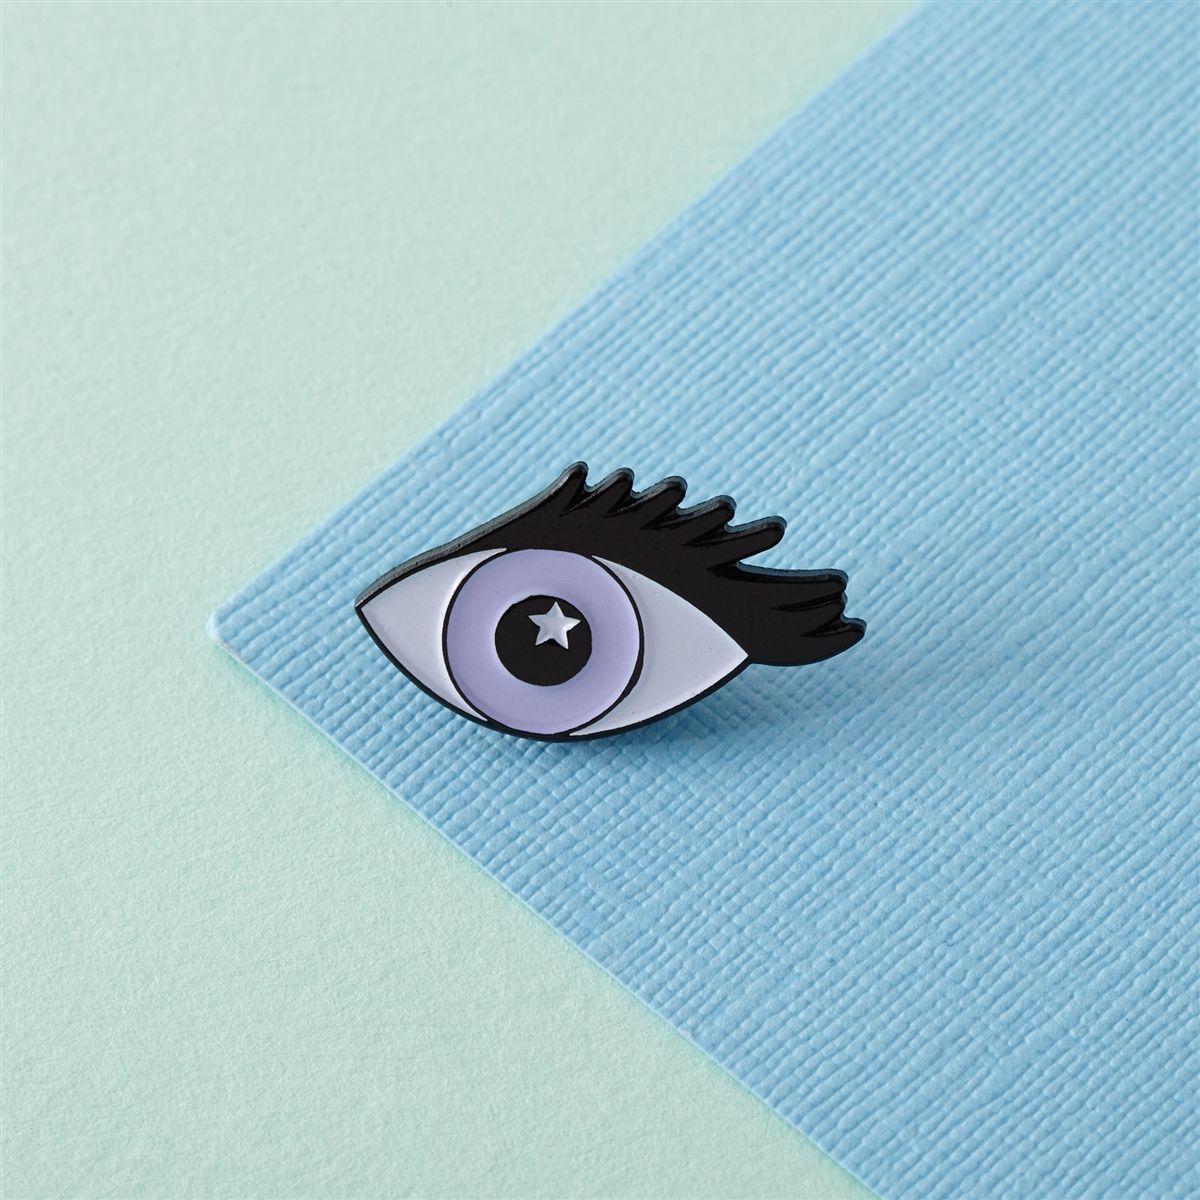 Eye enamel pin enamel pins lapel pins pin and patches